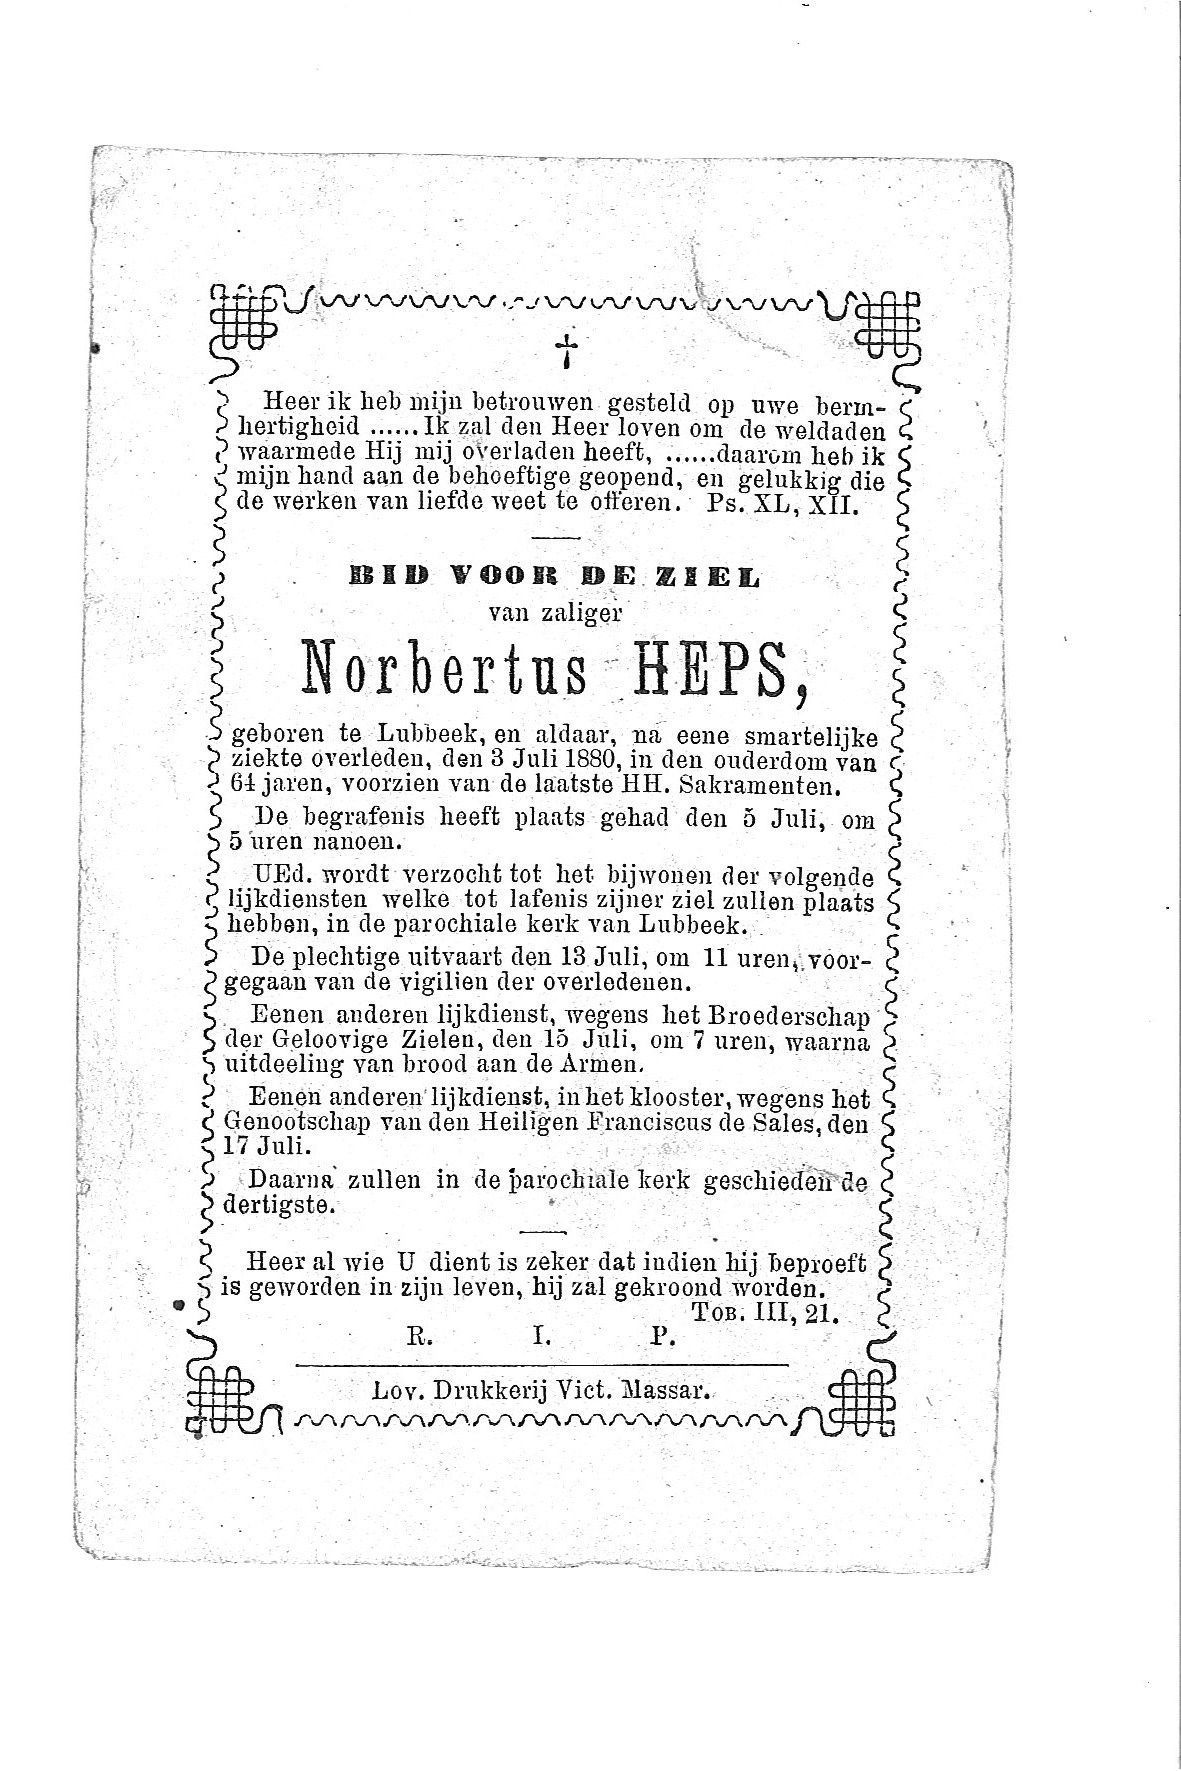 norbertus(1880)20090427112512_00044.jpg